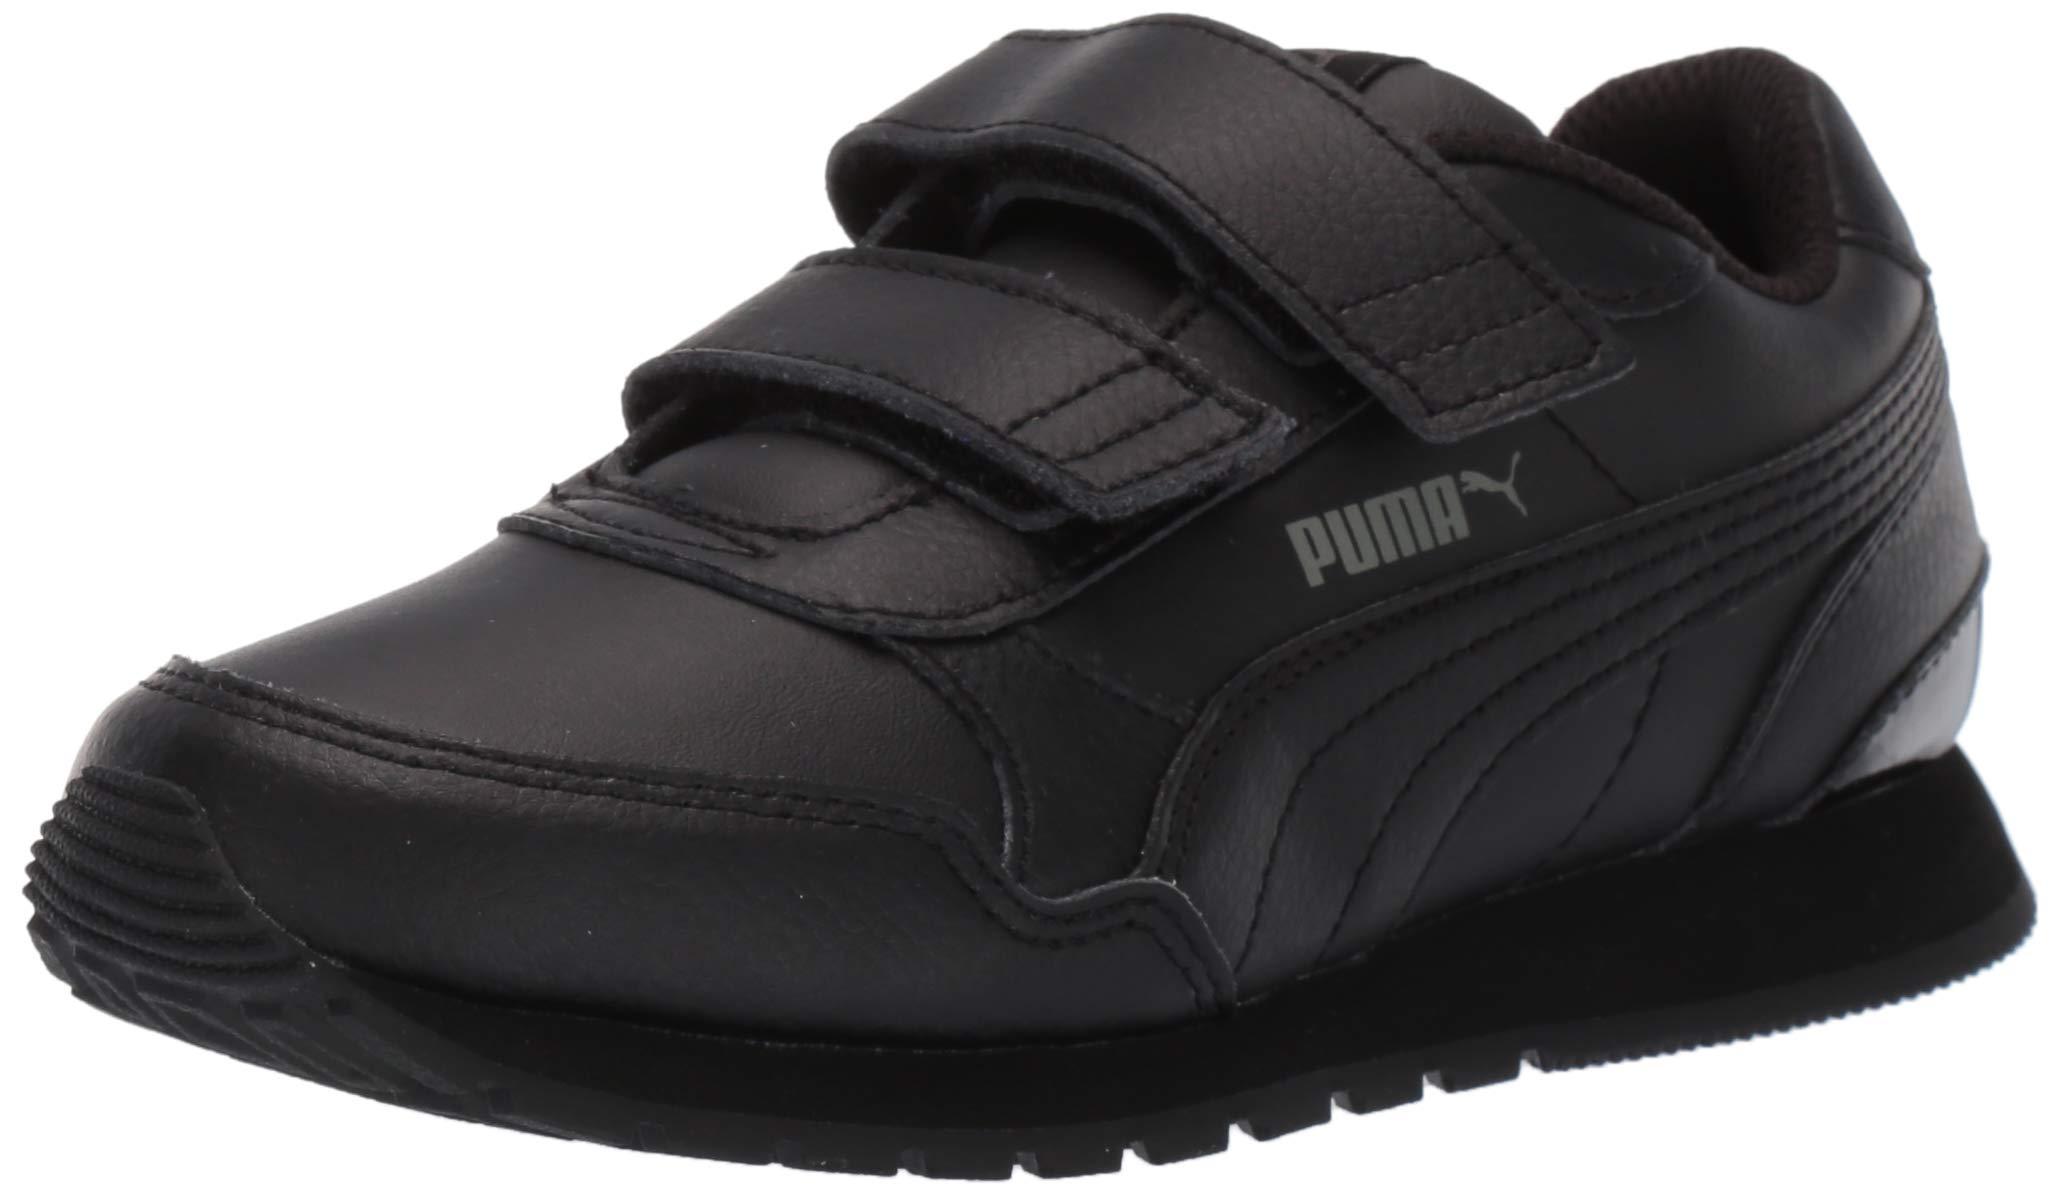 PUMA Baby ST Runner V2 Velcro Sneaker Black-Dark Shadow, 10 M US Toddler by PUMA